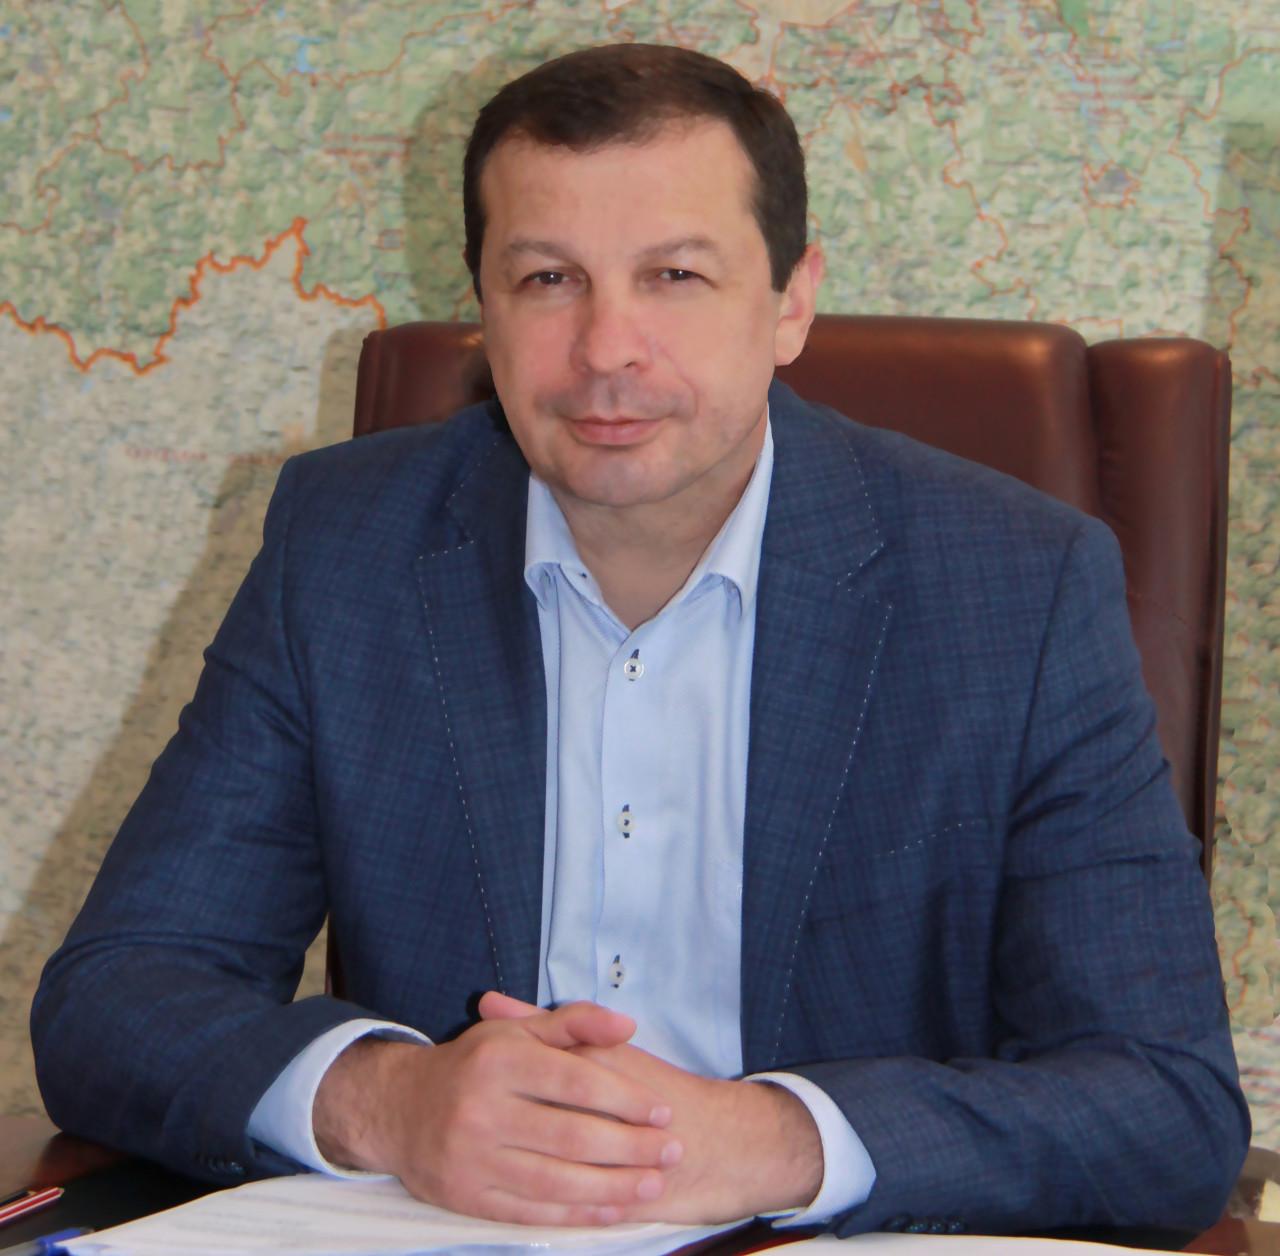 Климов Дмитрий Валерьевич